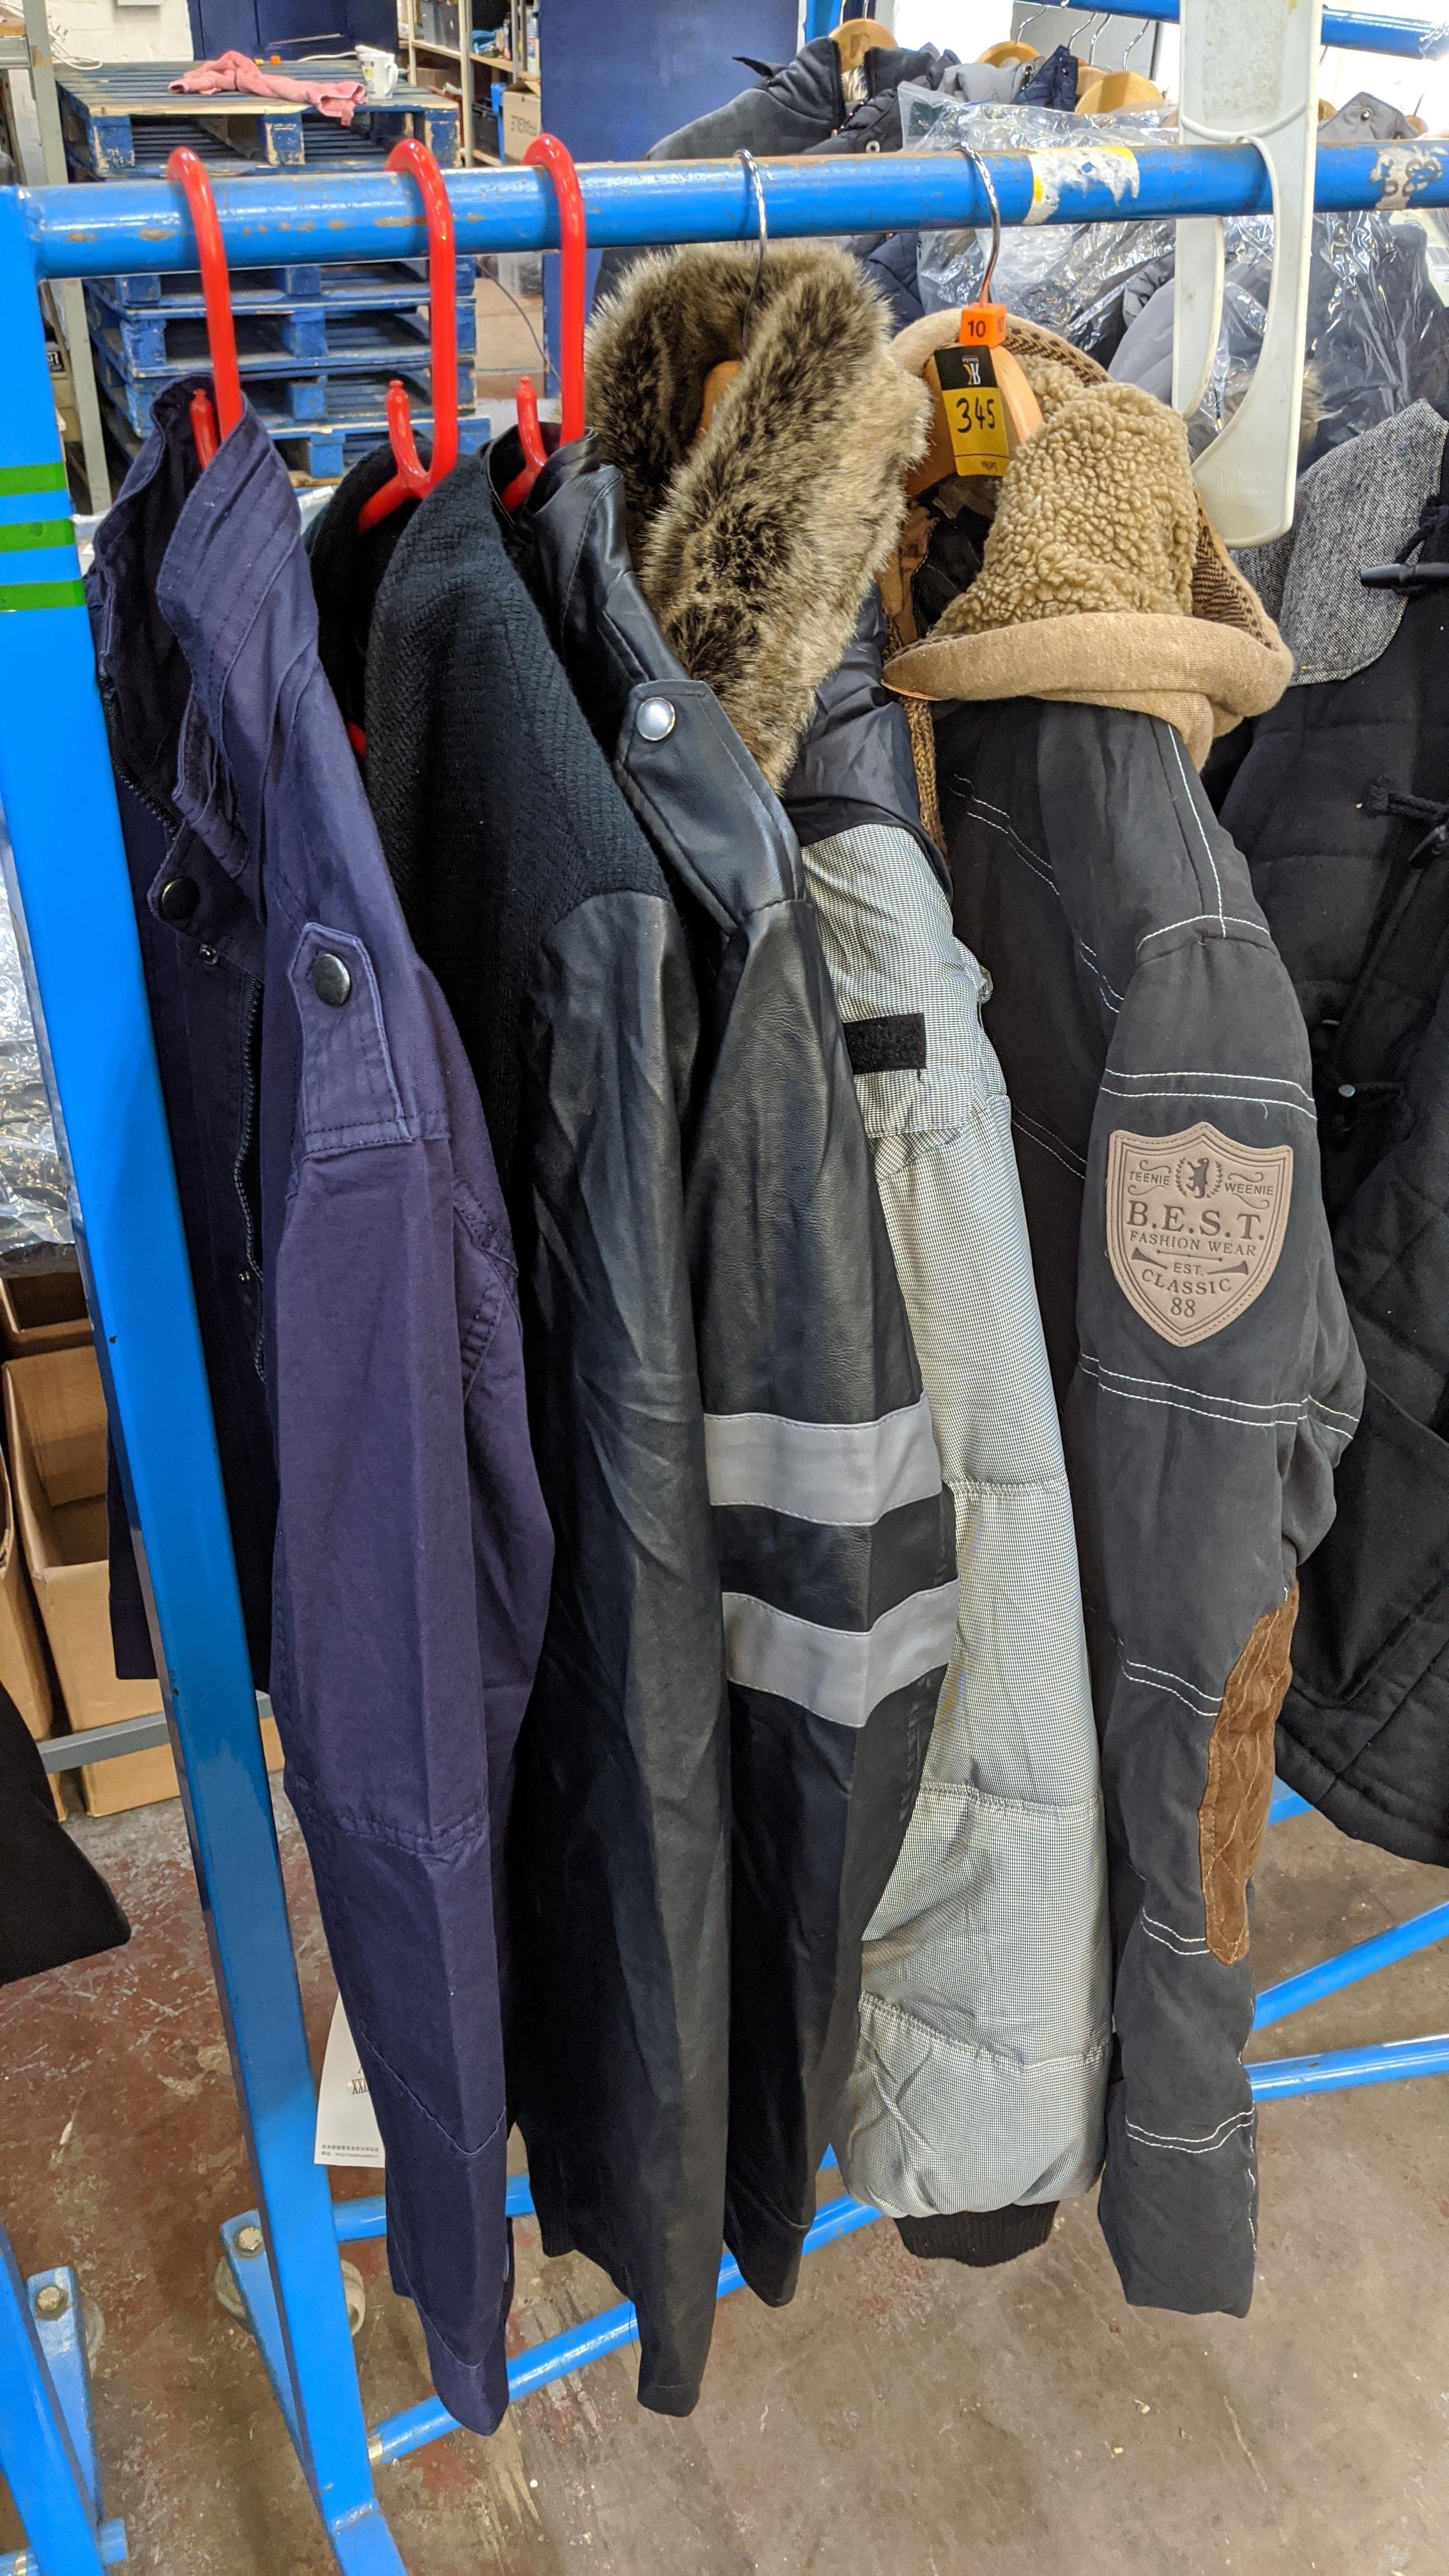 Very large quantity of primarily men's designer clothing & accessories. - Image 108 of 157